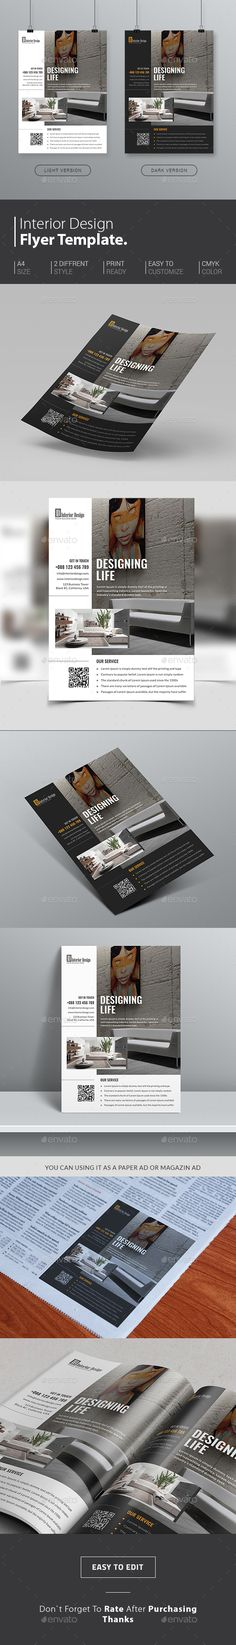 Interior Design Flyer Template, suitable for #realestate #interiordesign promotion. http://graphicriver.net/item/interior-design-flyer/14926847?ref=themedevisers